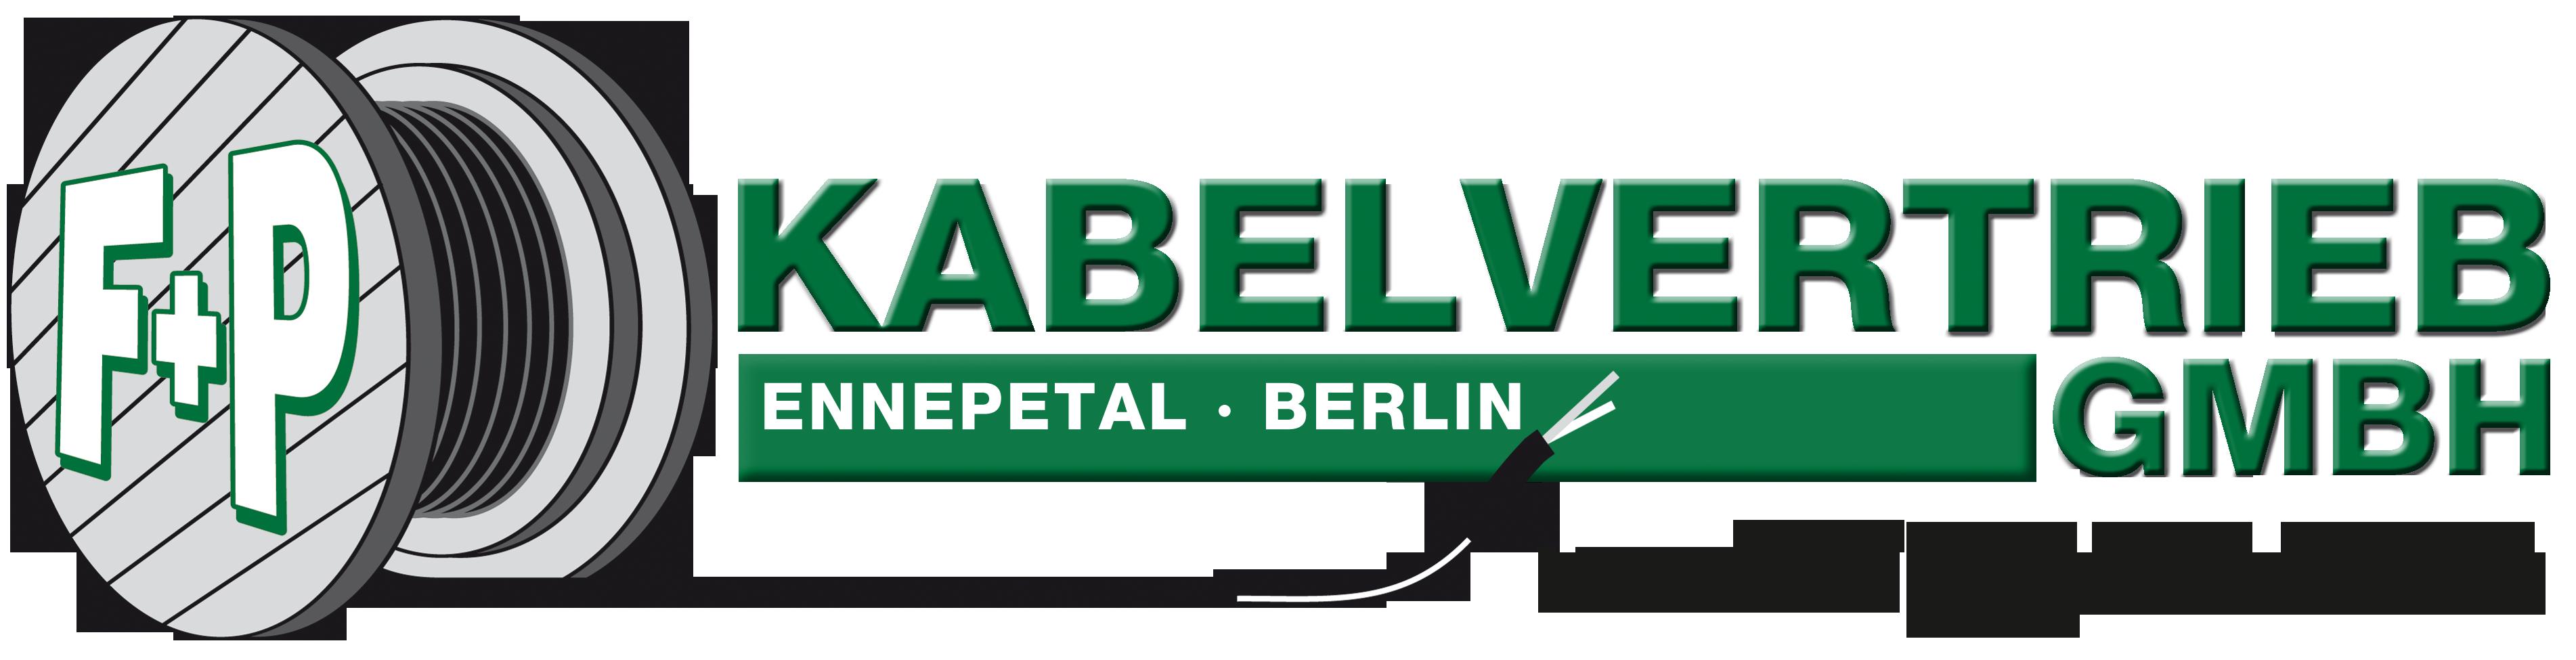 F+P Kabelvertrieb GmbH